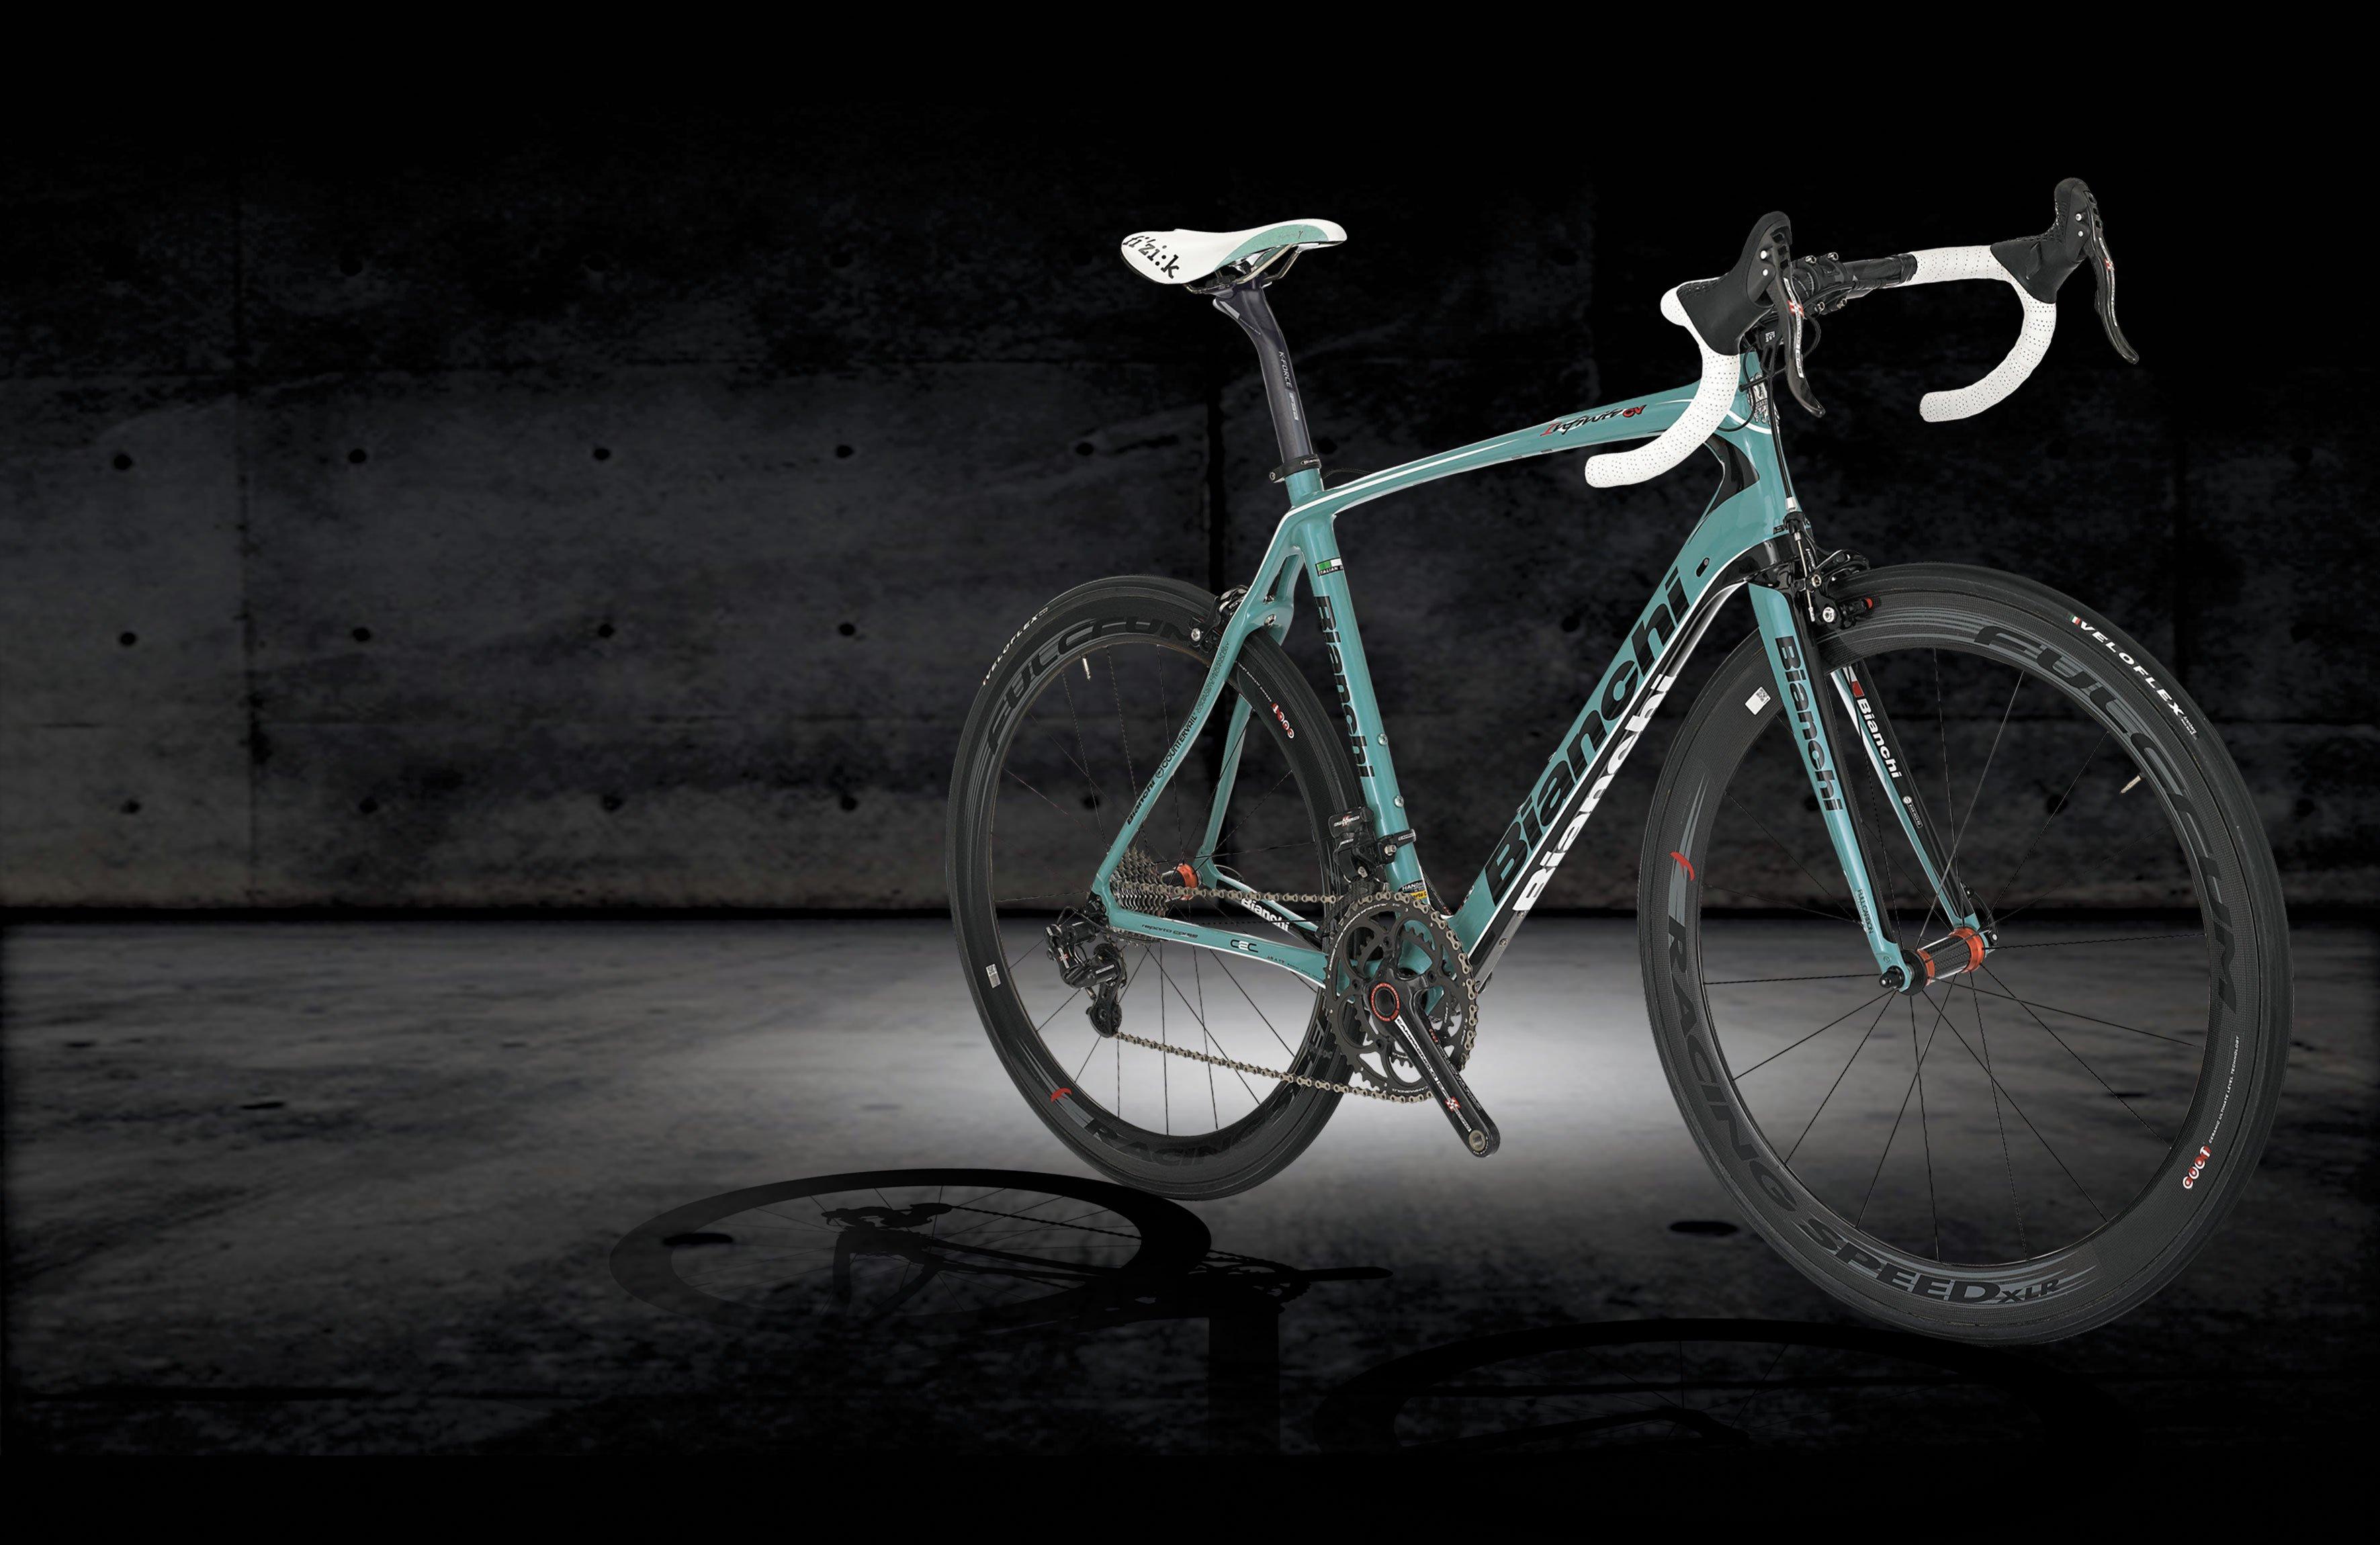 Bianchi Bicycle Bike Wallpaper 3543x2300 463010